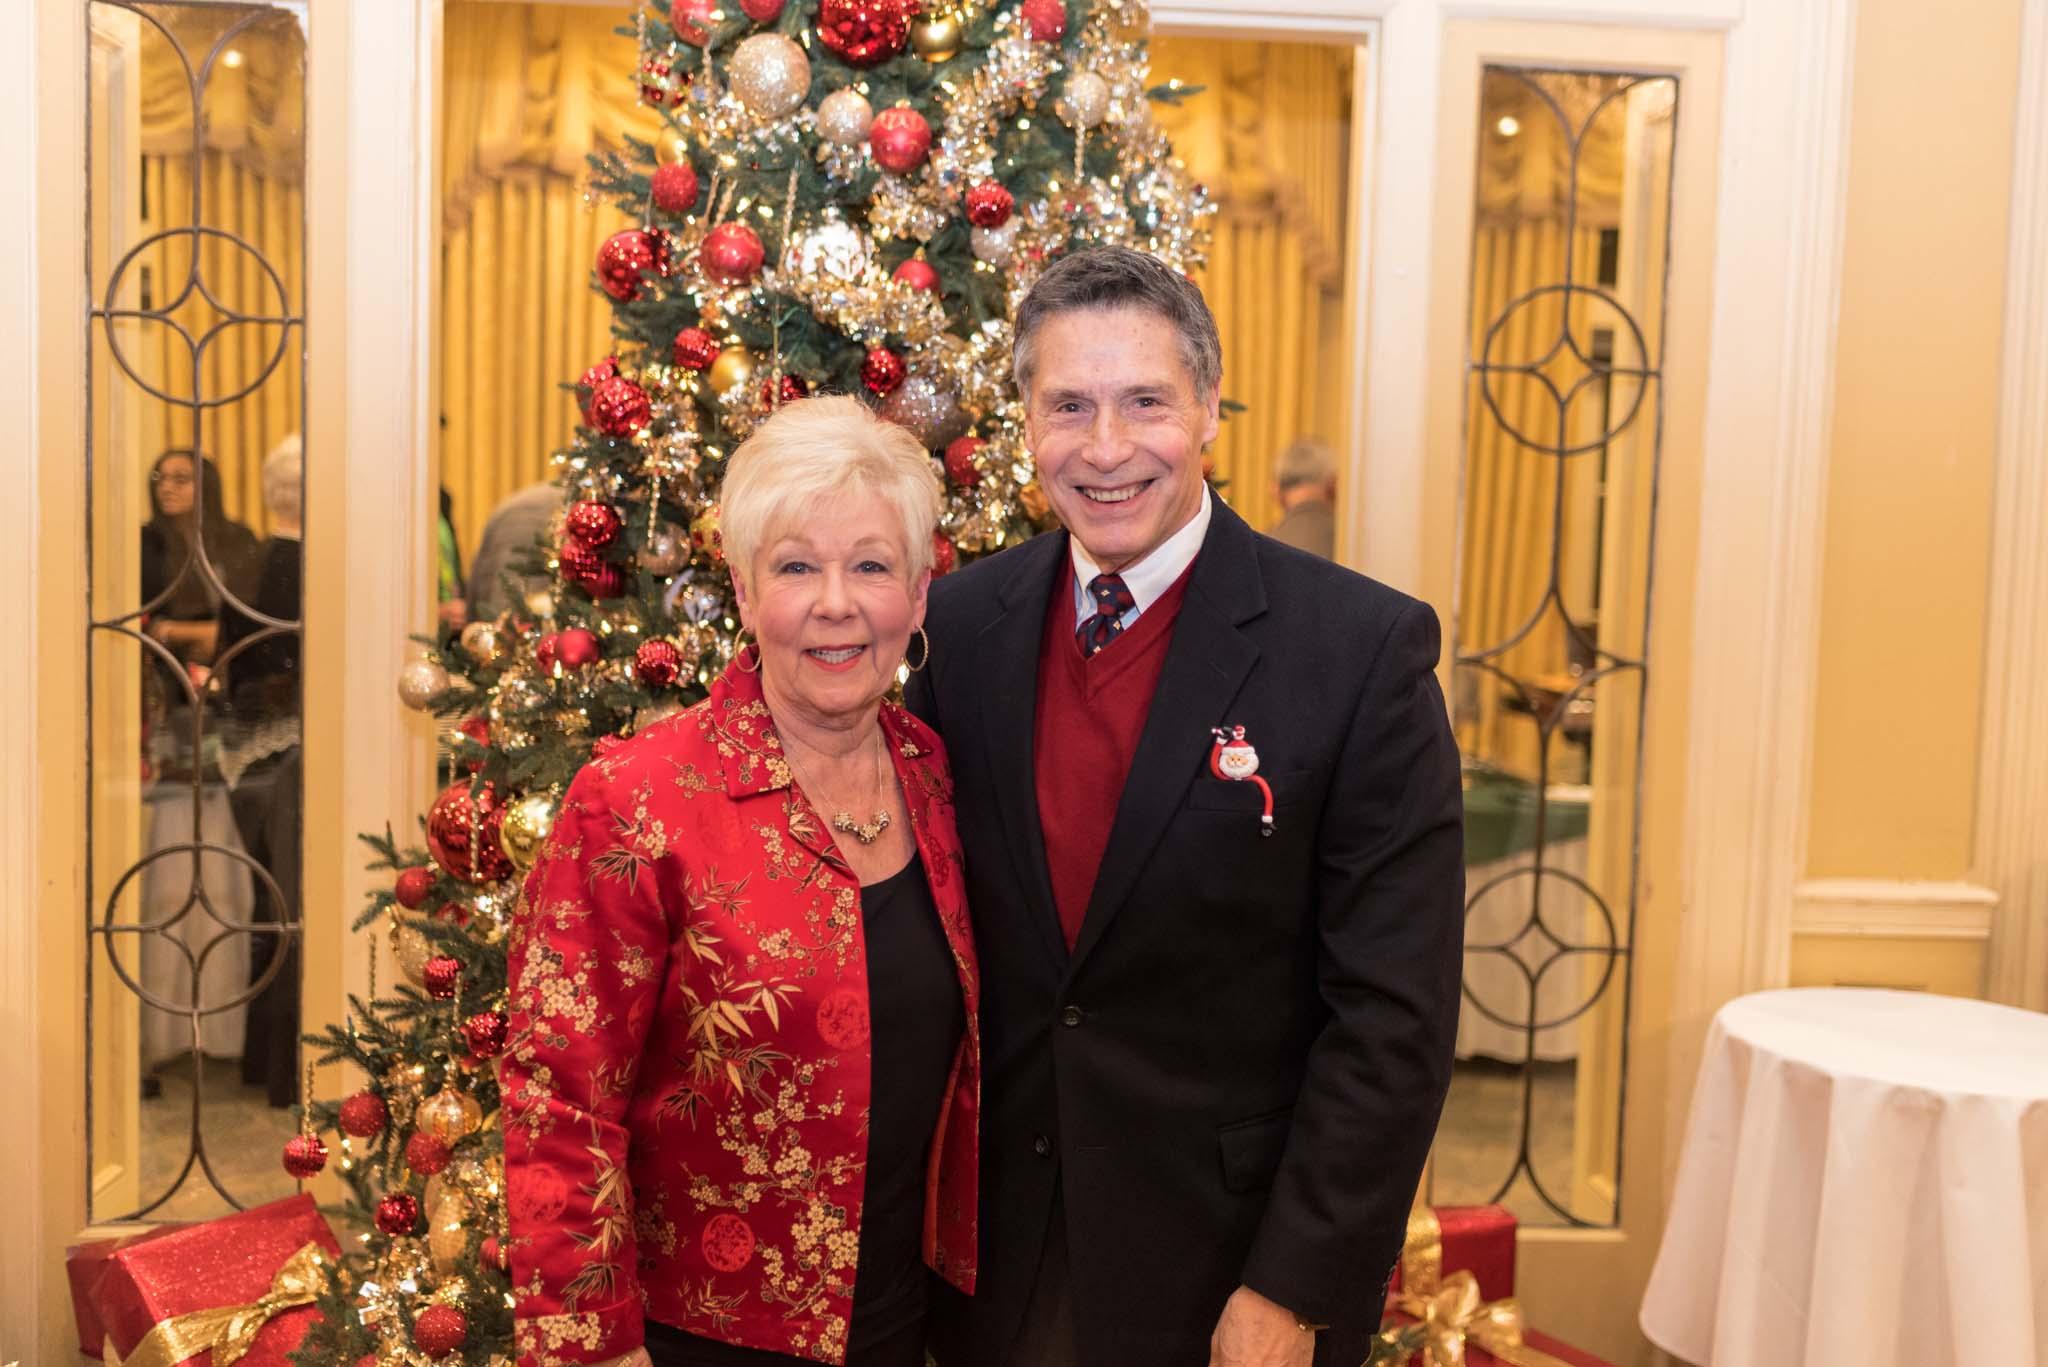 Gail and Gene Cogbill